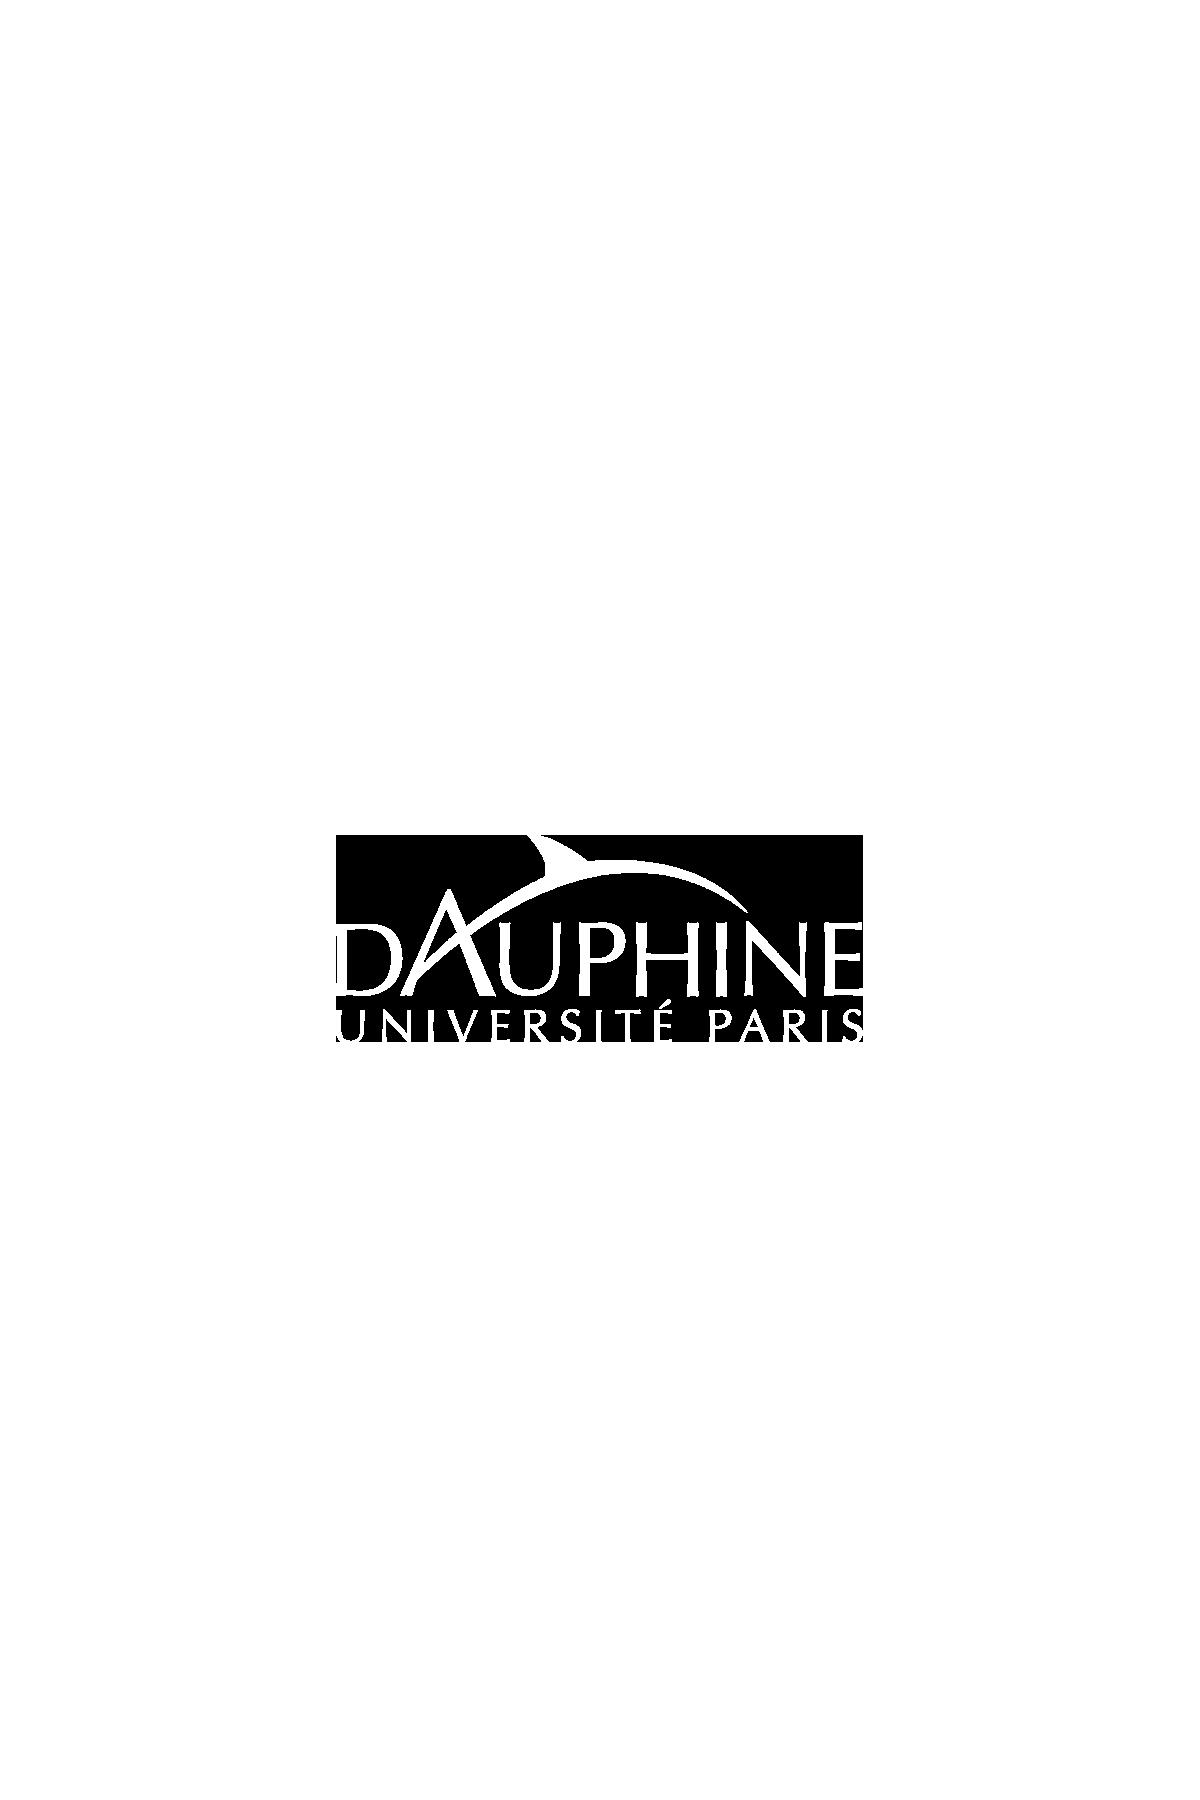 Dauphine